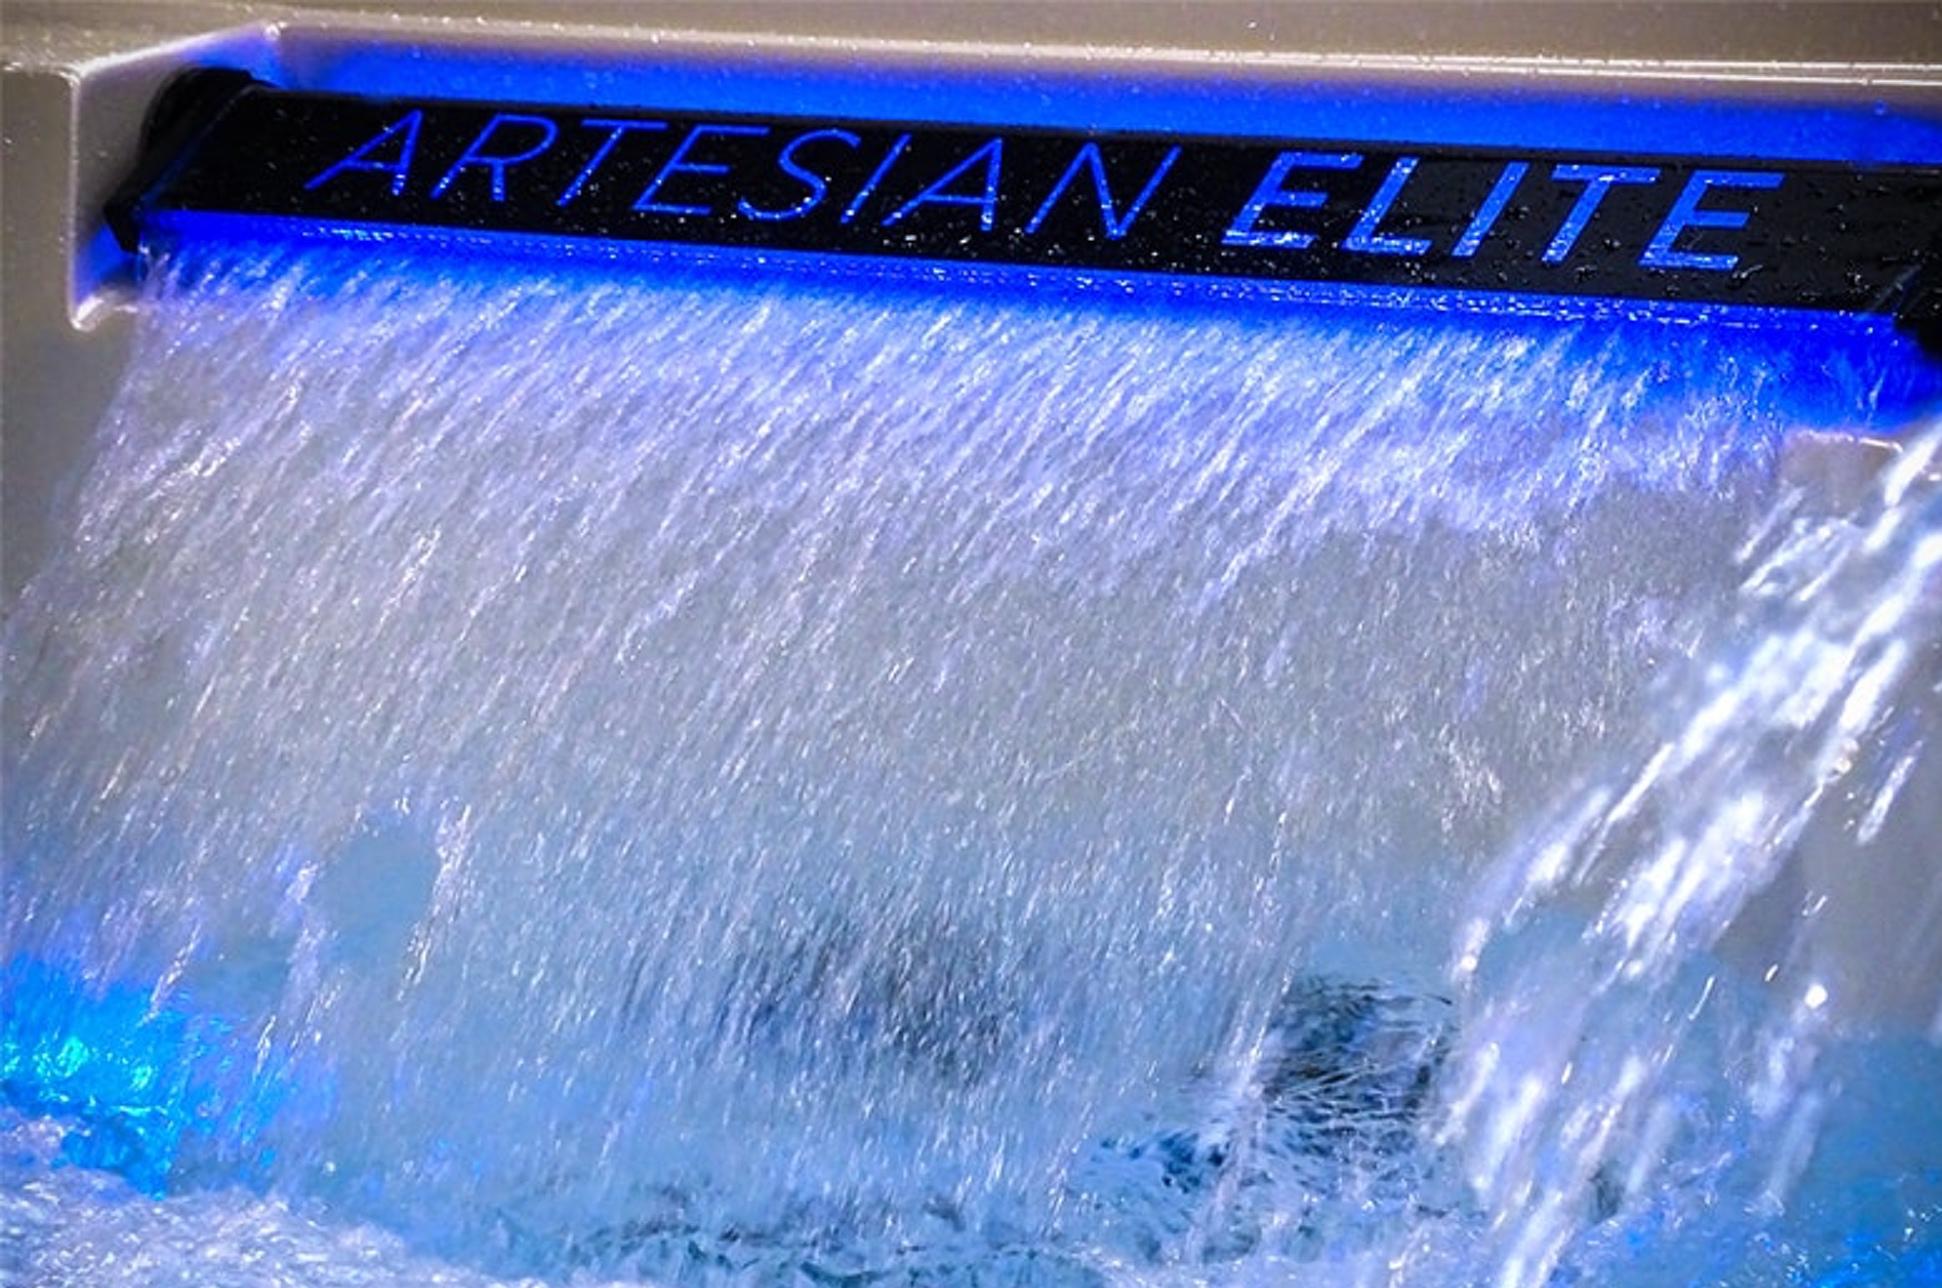 vodopád vírivky Artesian Elite